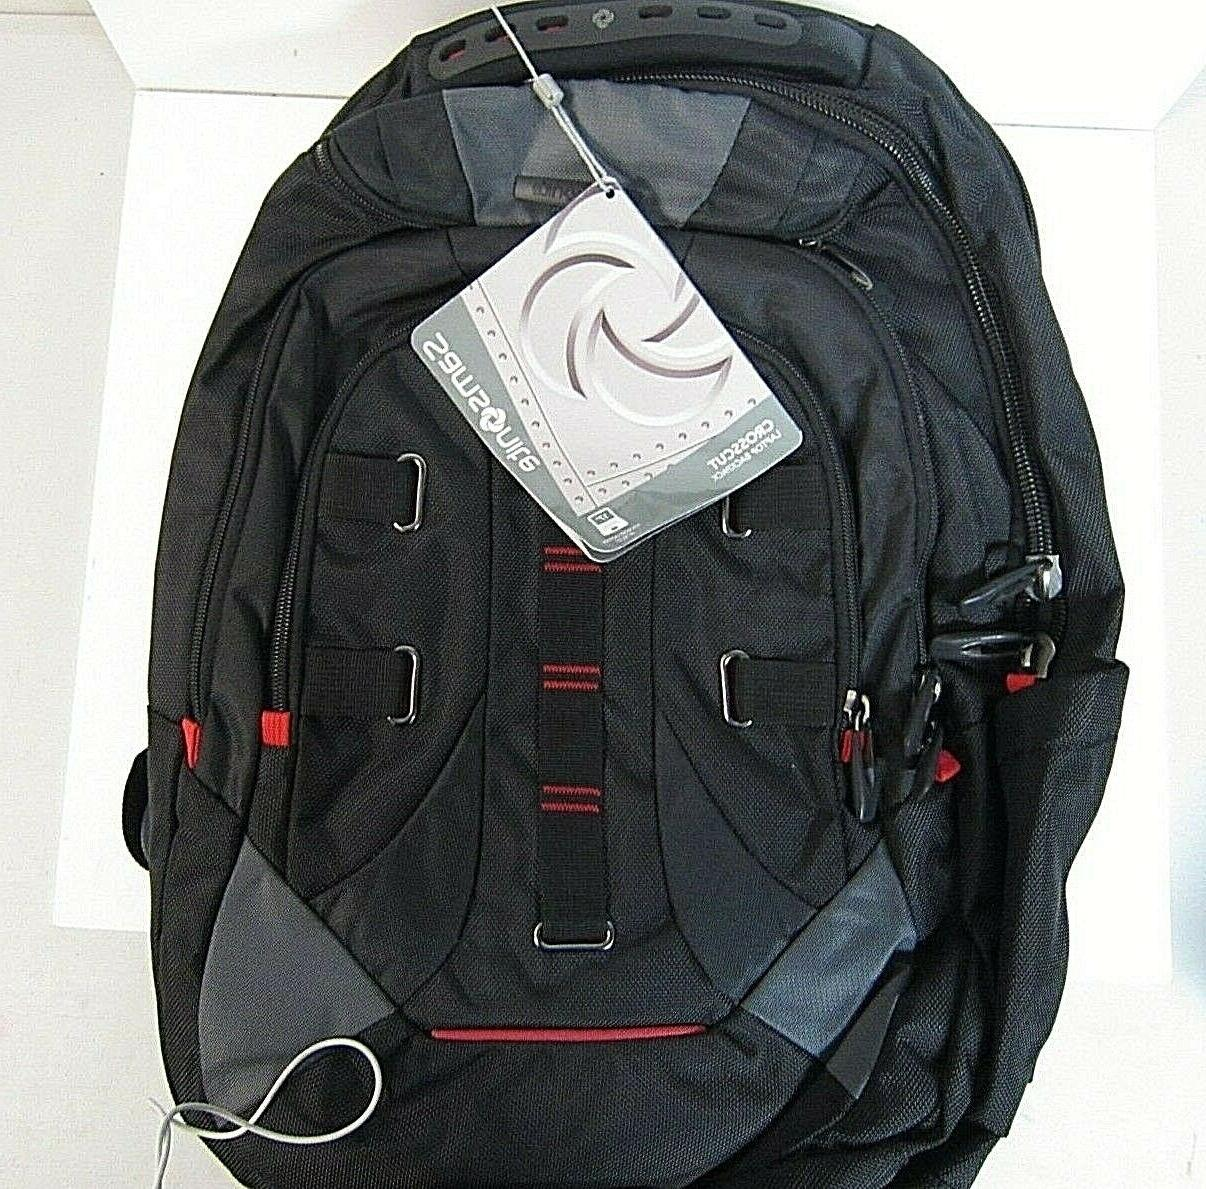 Samsonite - Laptop Backpack - Black